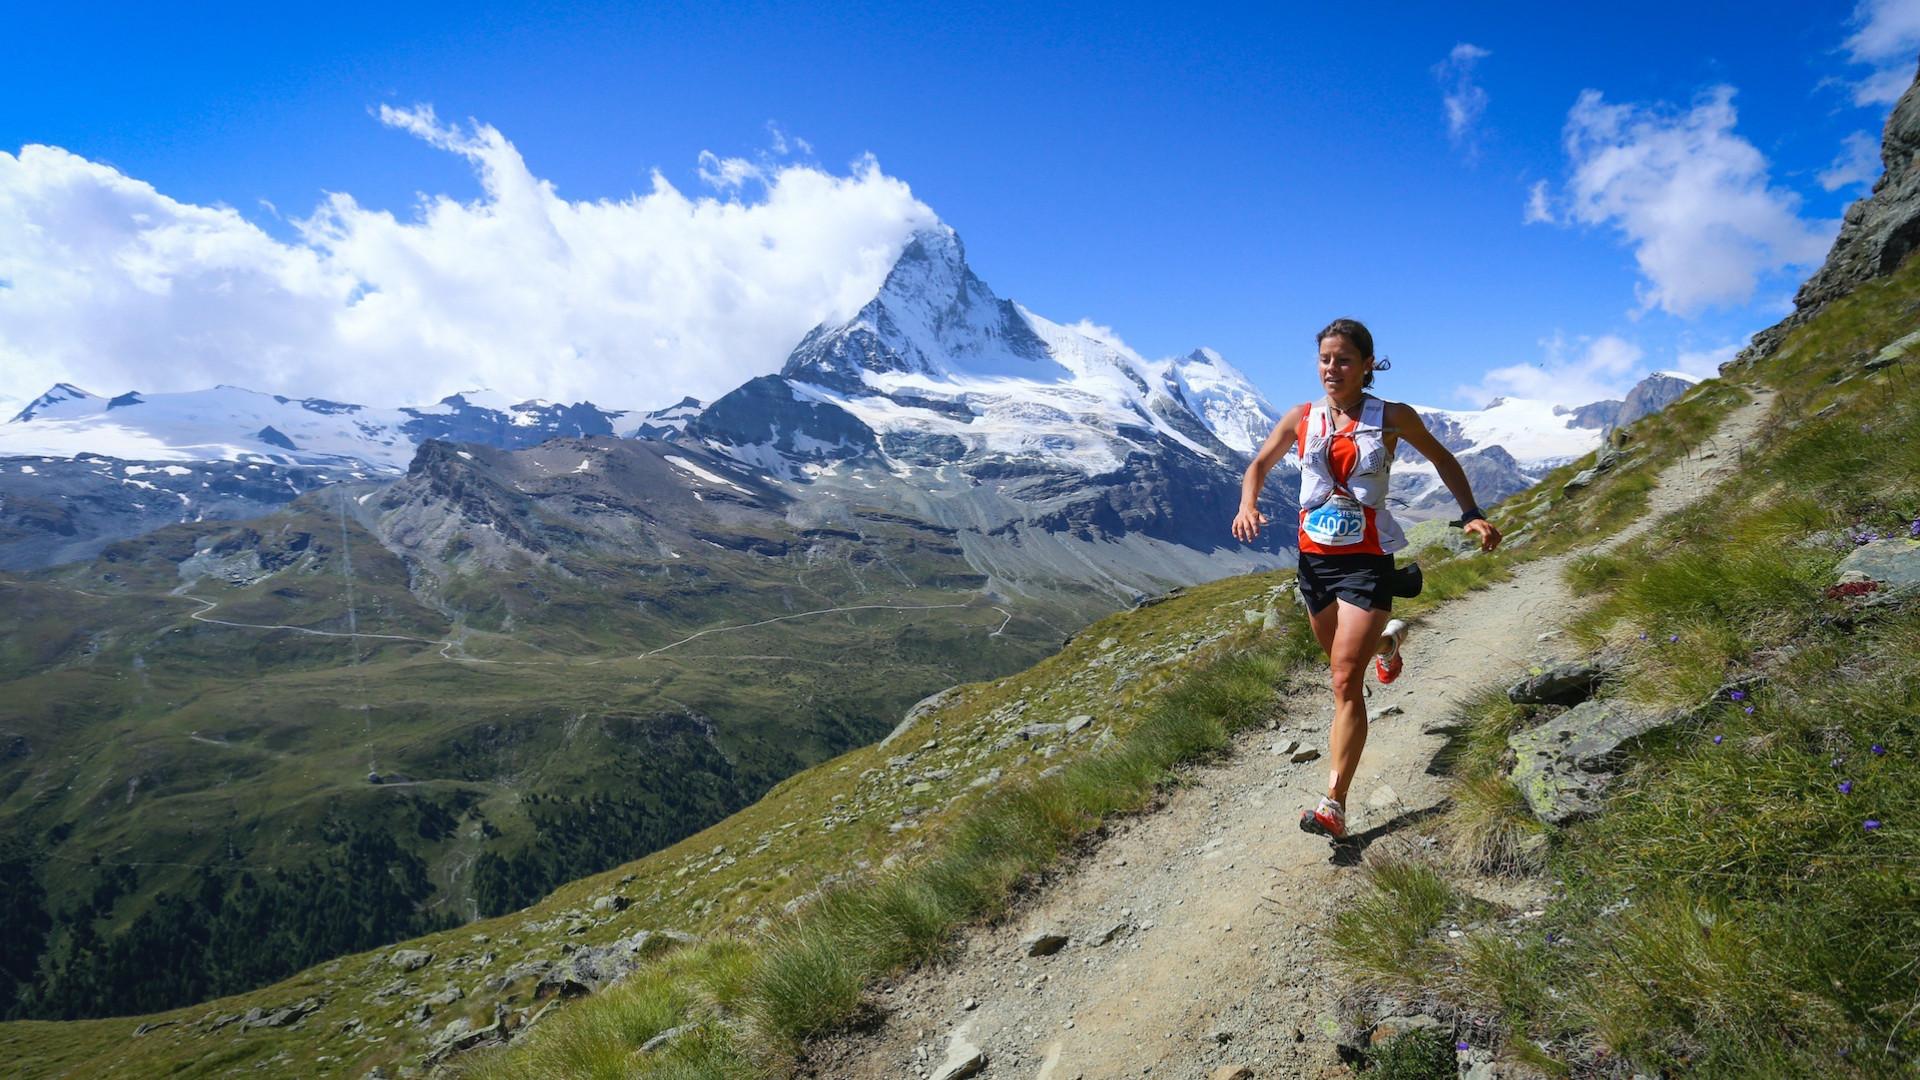 Taking on the Matterhorn Ultraks race